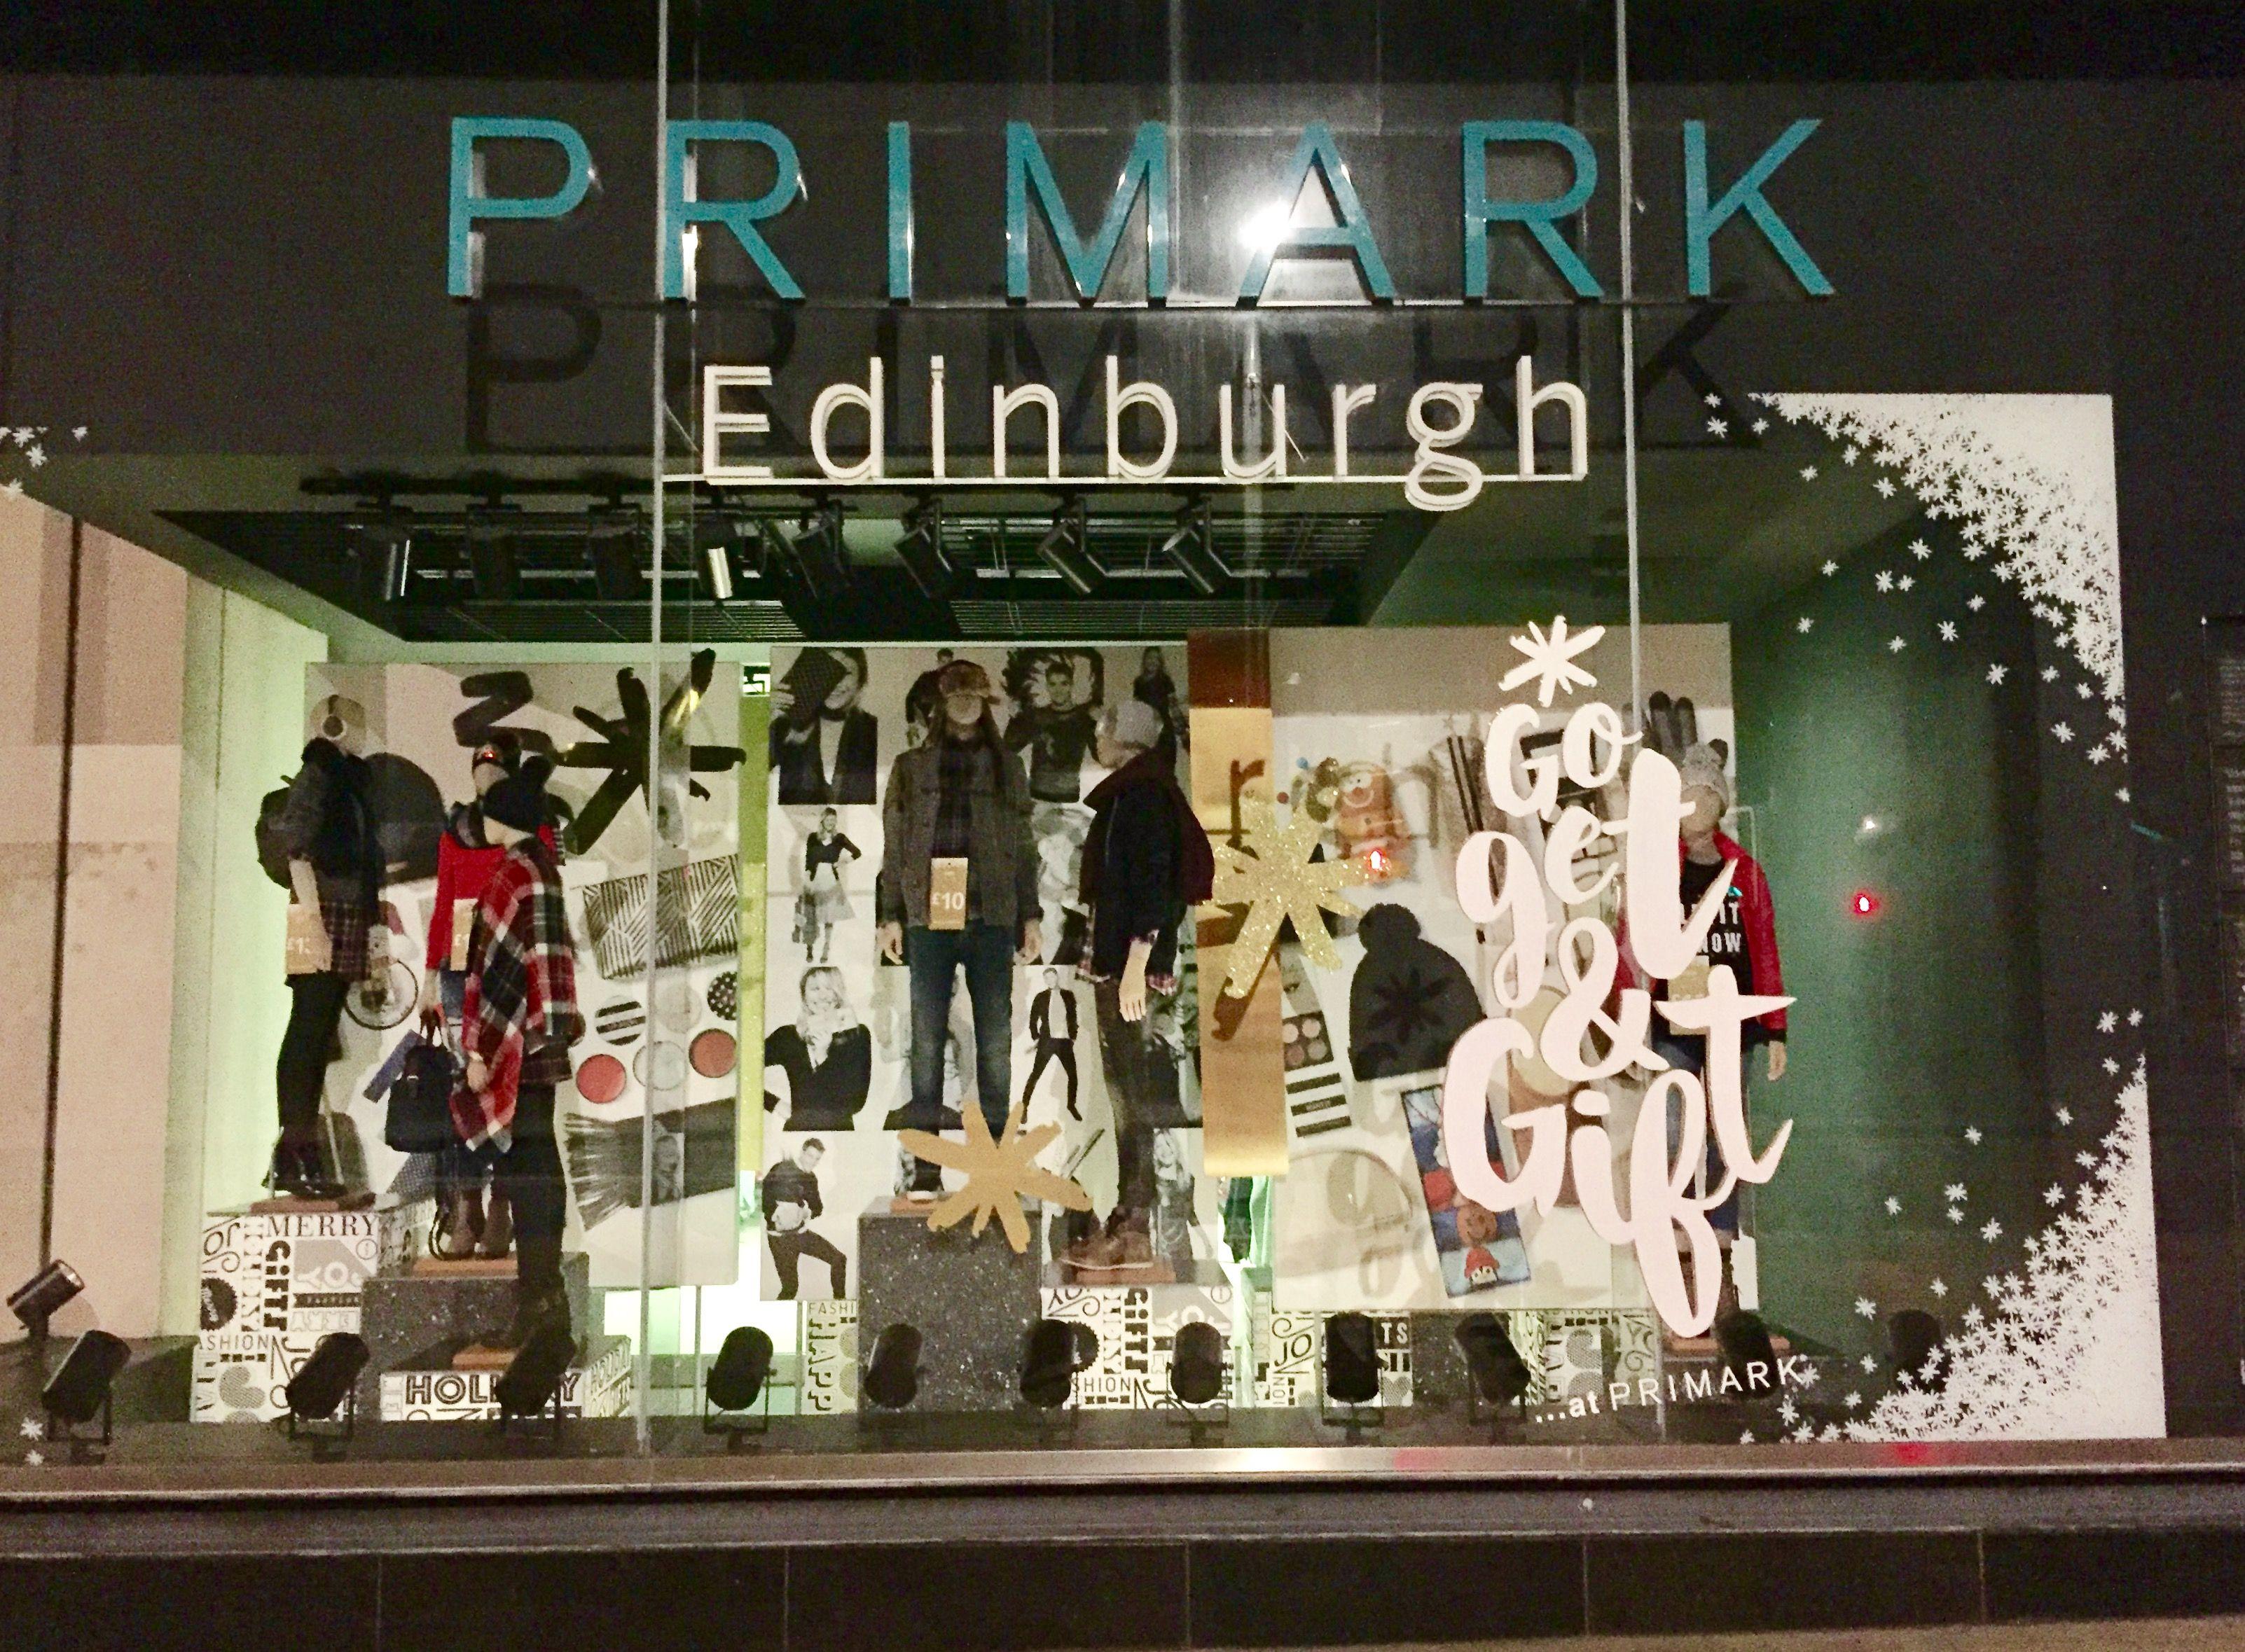 Primark Christmas 2016 Edinburgh